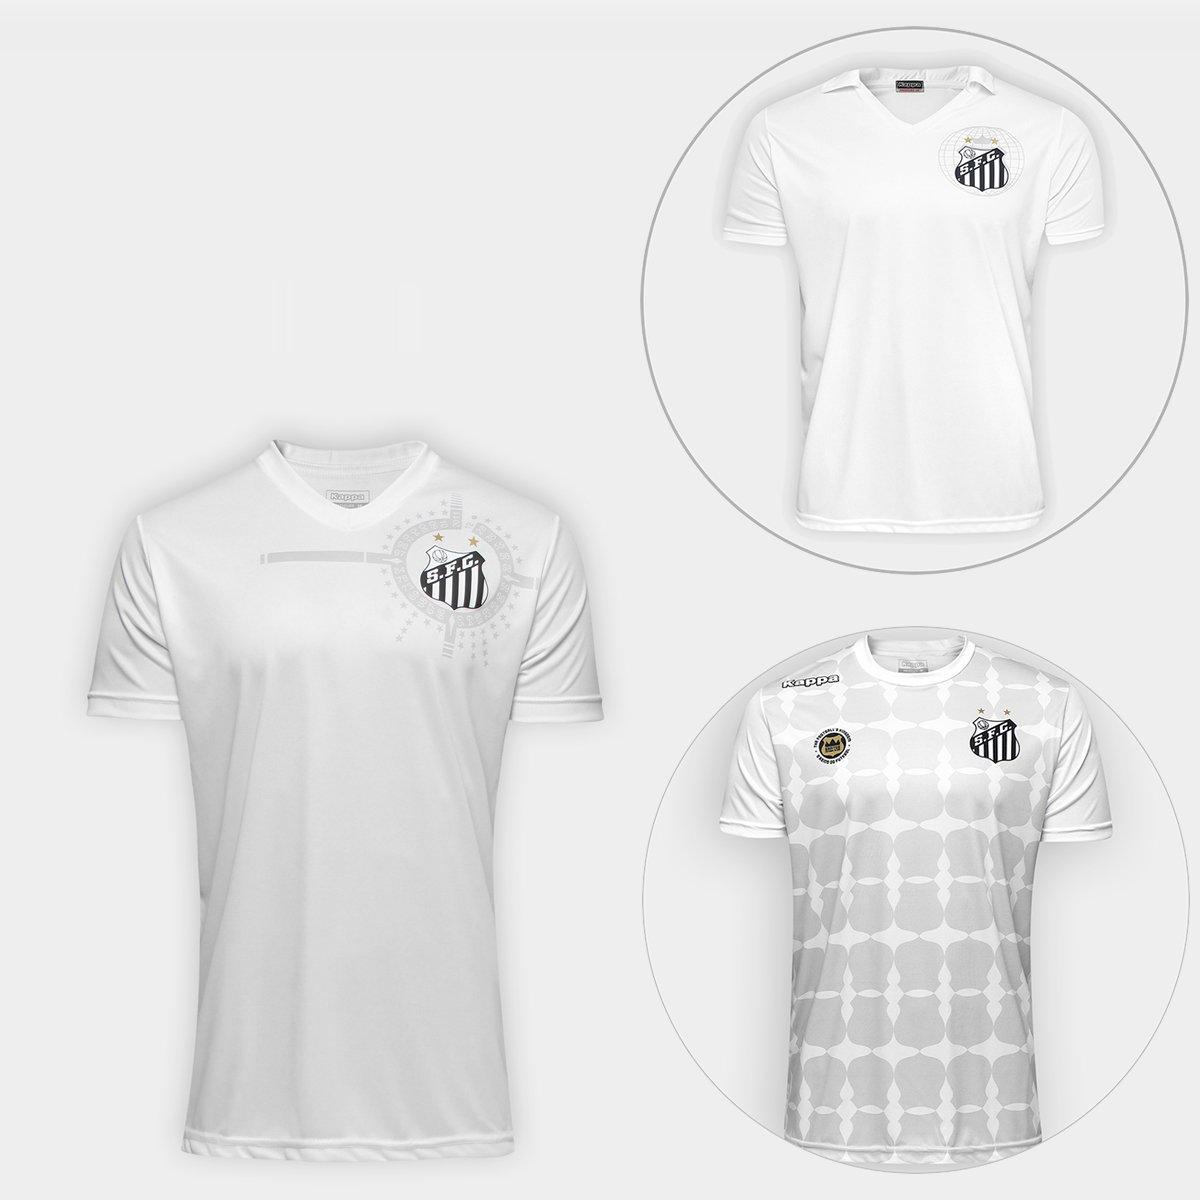 Master Kit do Santos - Camisa América 2011 + Camisa 2010 + Camisa Ed.  Limitada - Compre Agora  258f4299d0a0f